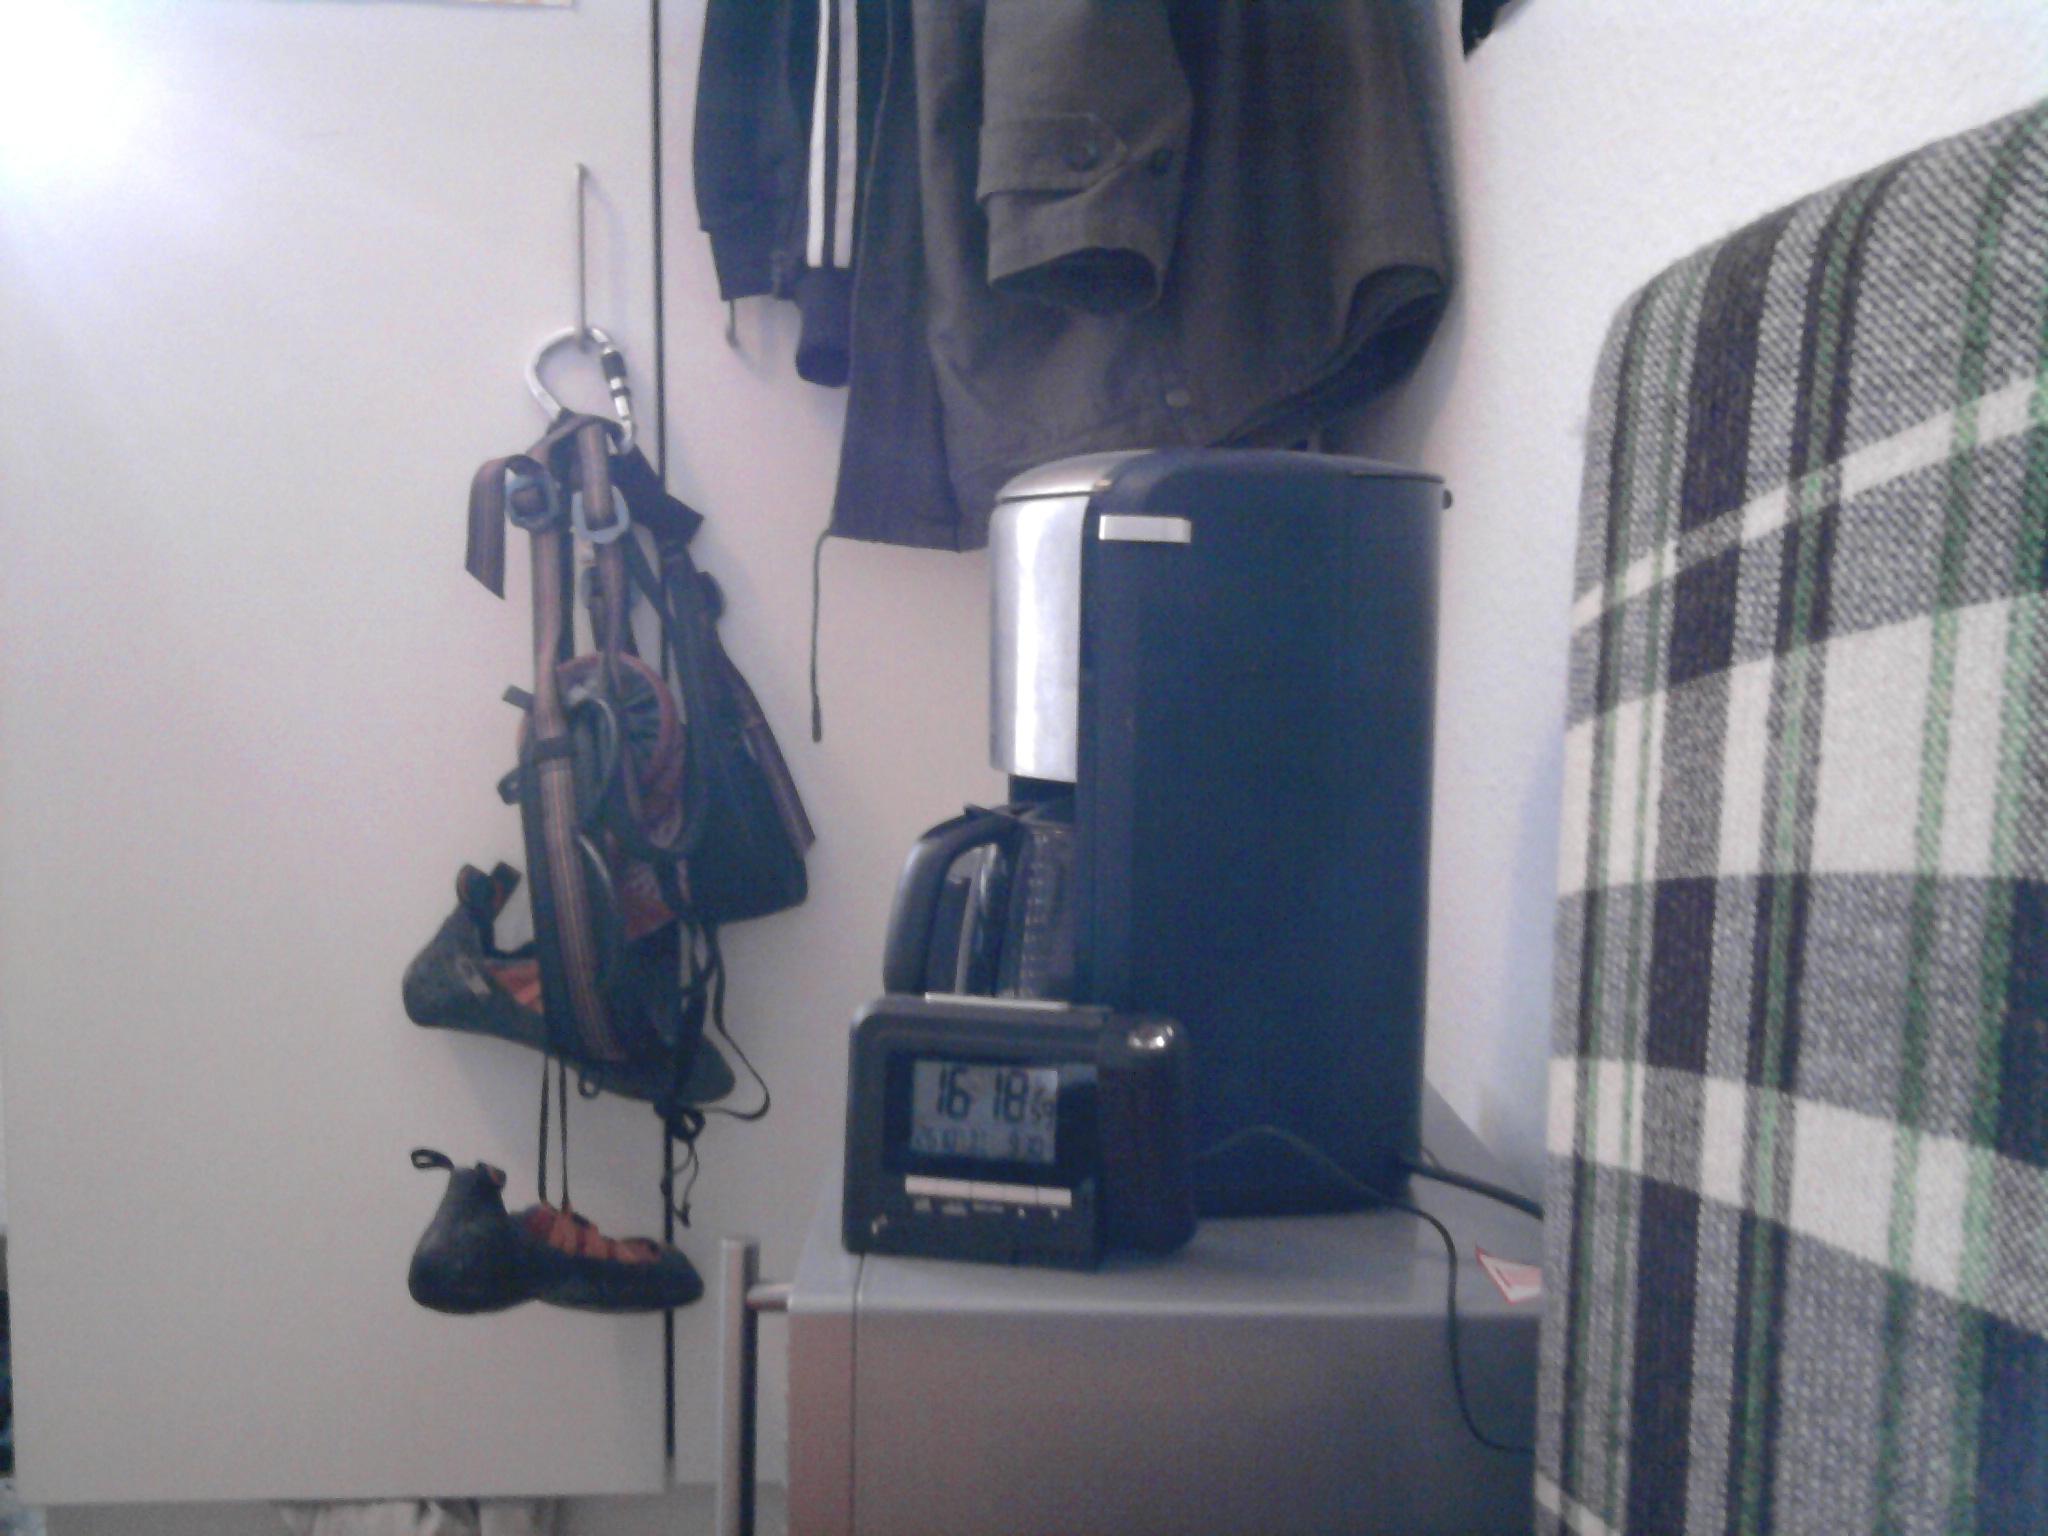 verlosung philips vitalight beendet spreeblick. Black Bedroom Furniture Sets. Home Design Ideas